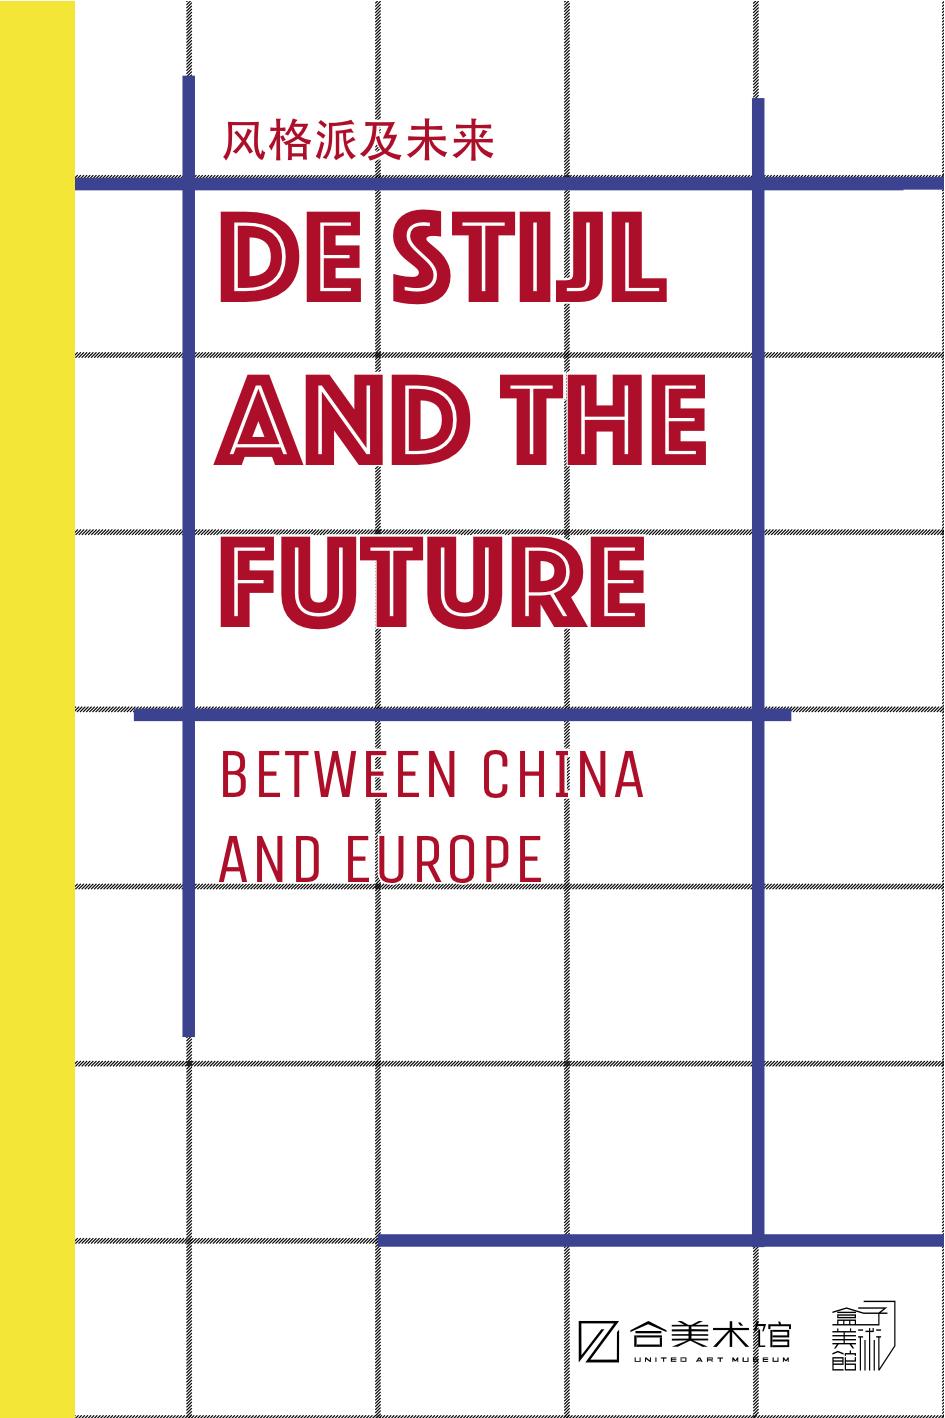 DE STIJL AND THE FUTURE CATALOGUE